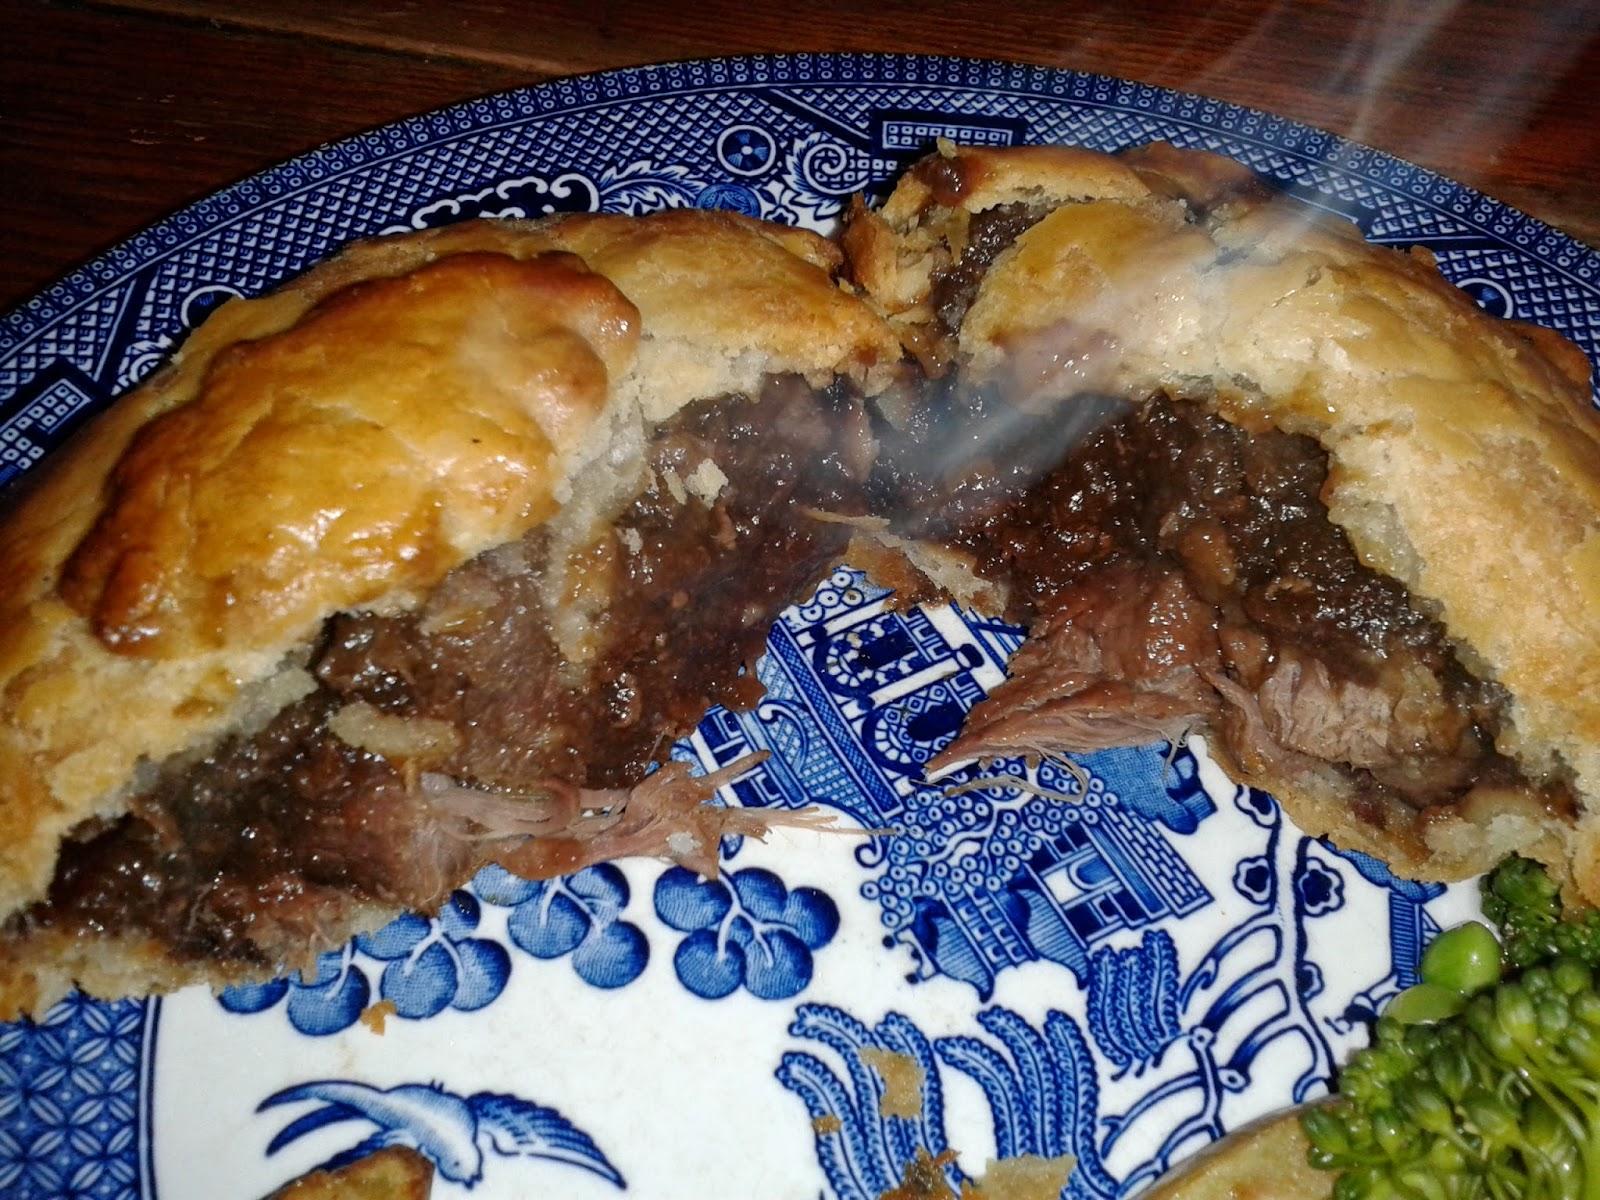 Dulverton Exclusive Cake Pie Cross section